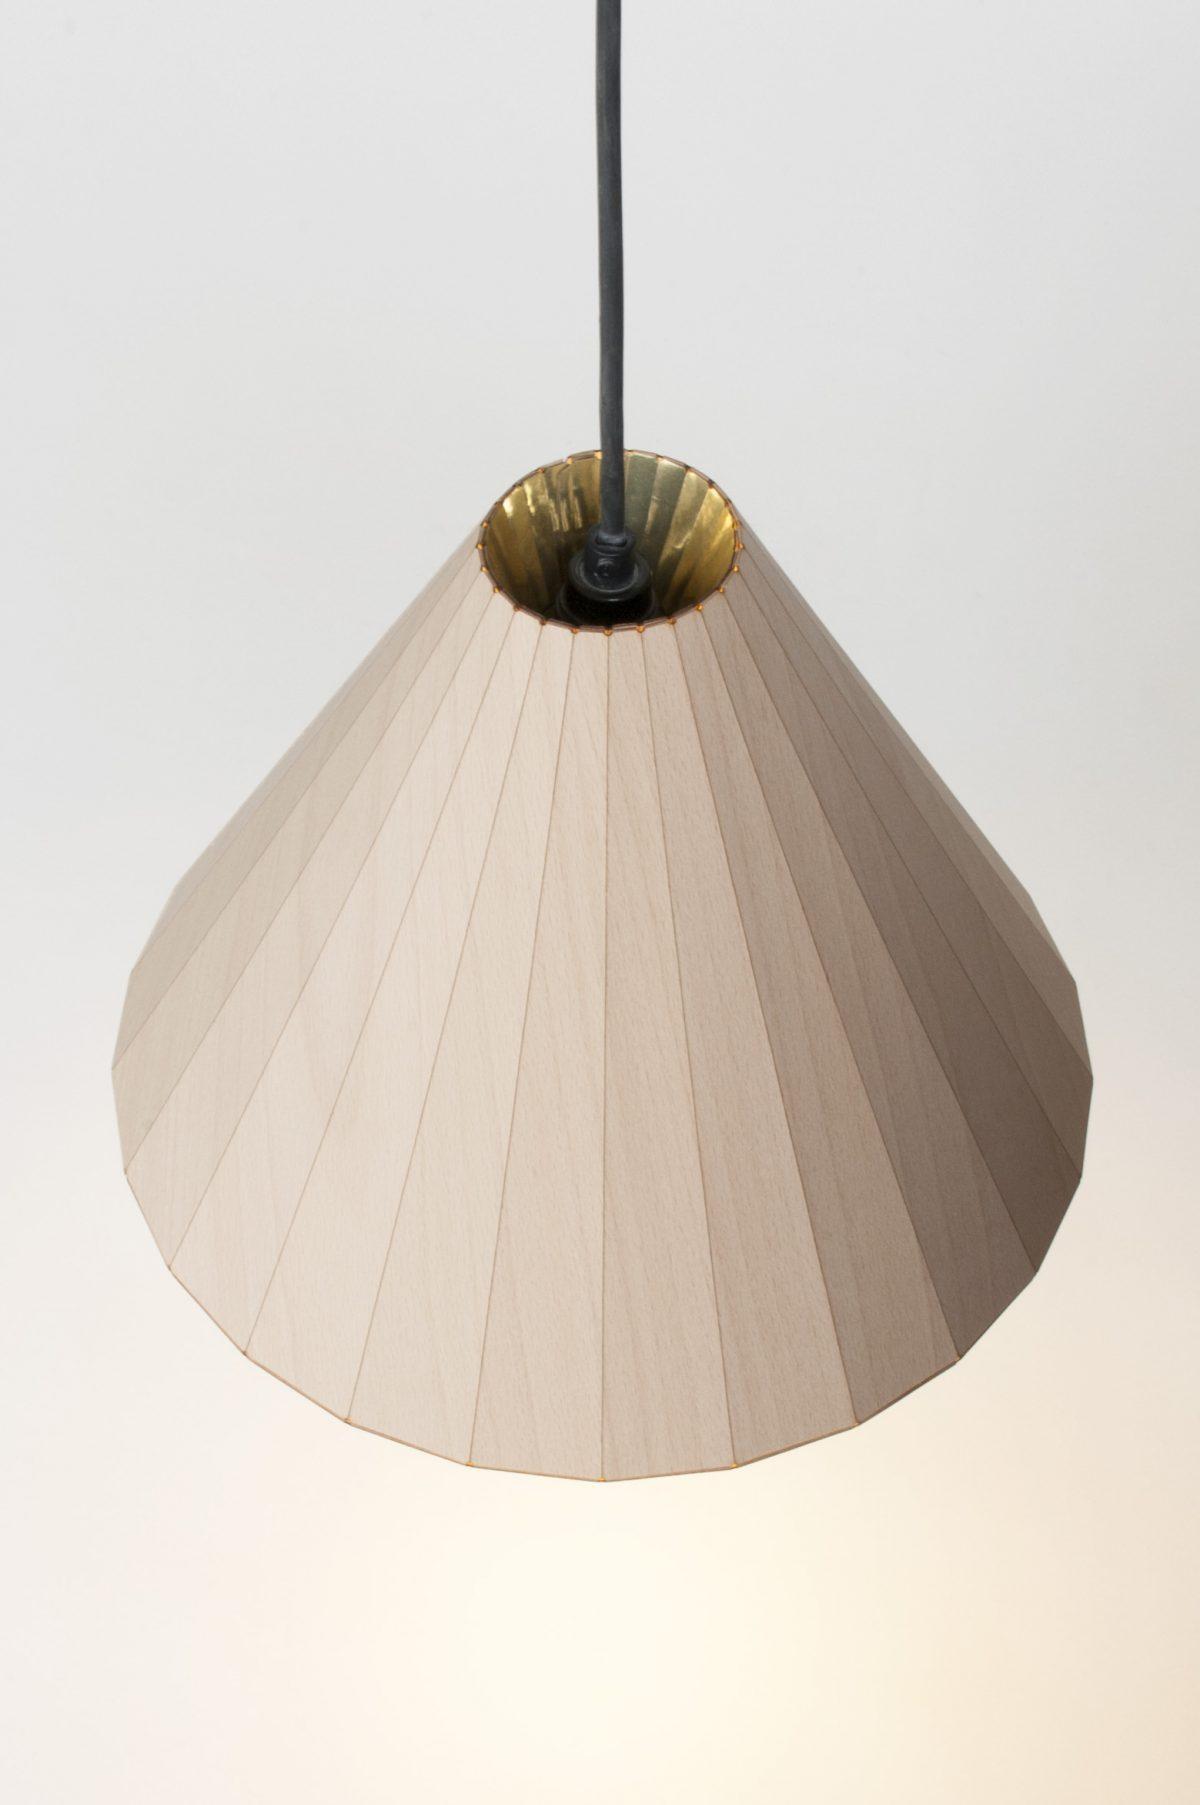 Hanglamp Wooden Light -David Derksen Design